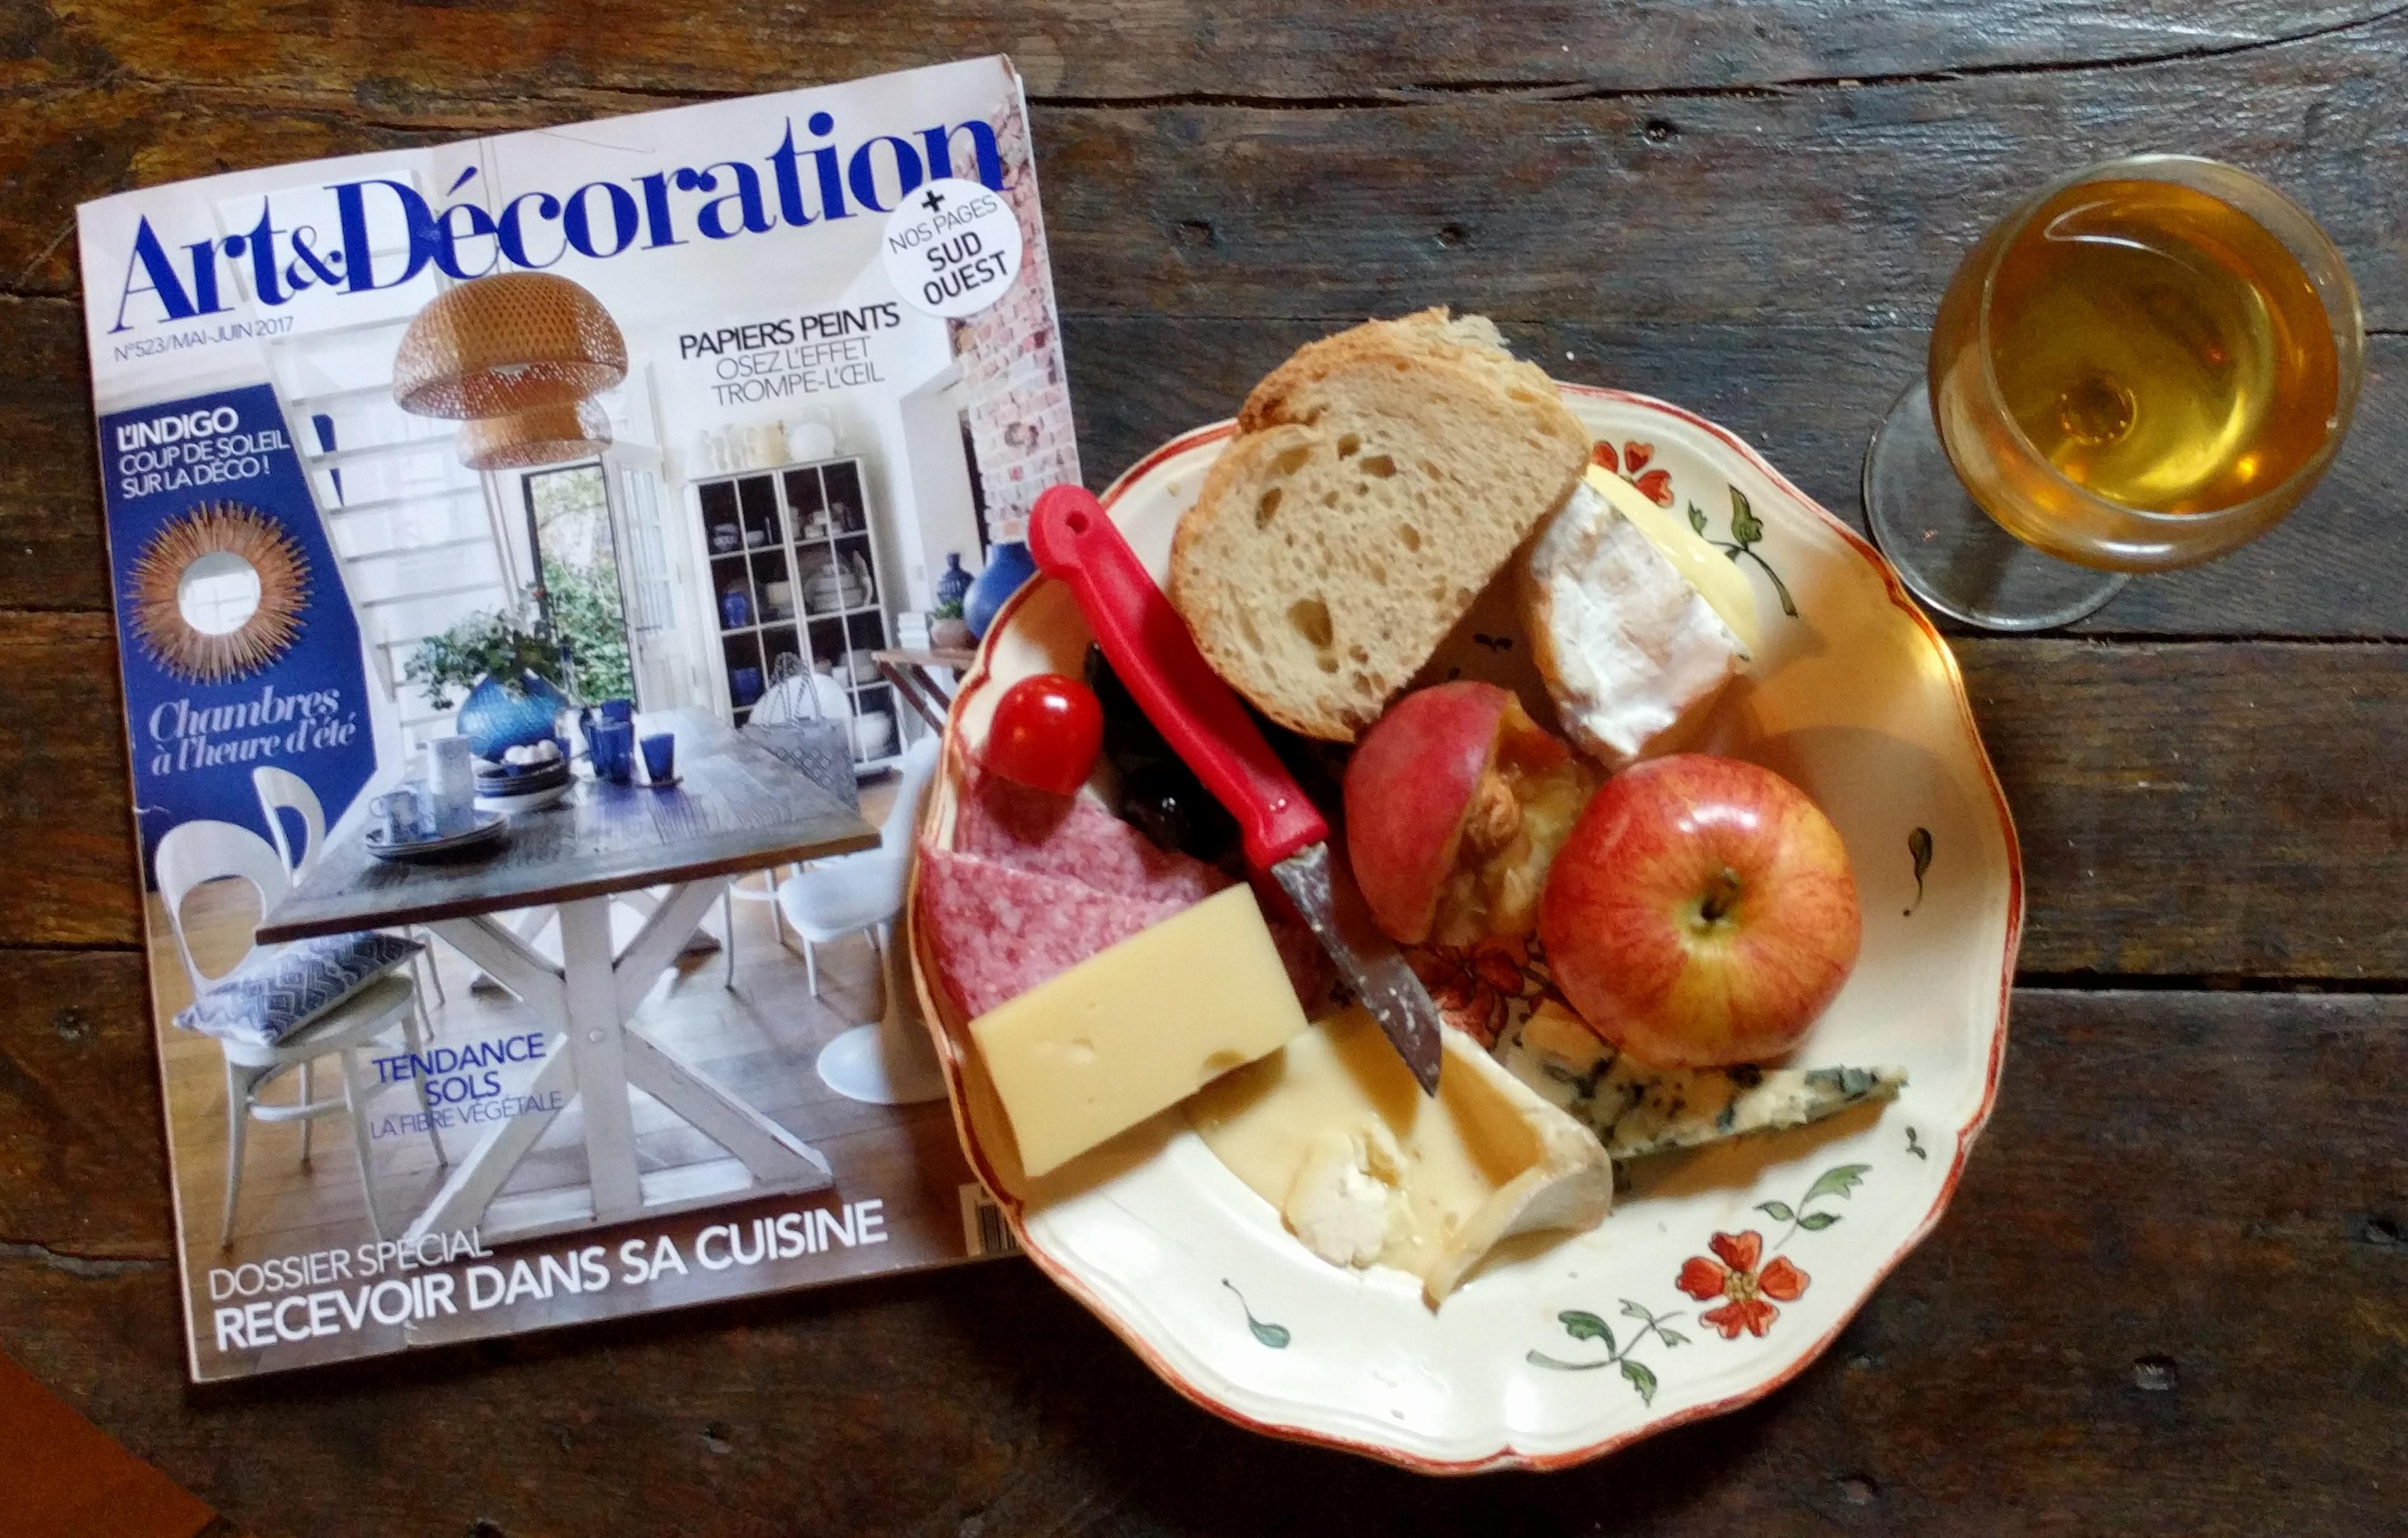 Art Et Decoration Juin 2017 soar-dream-france: face, feet and finds